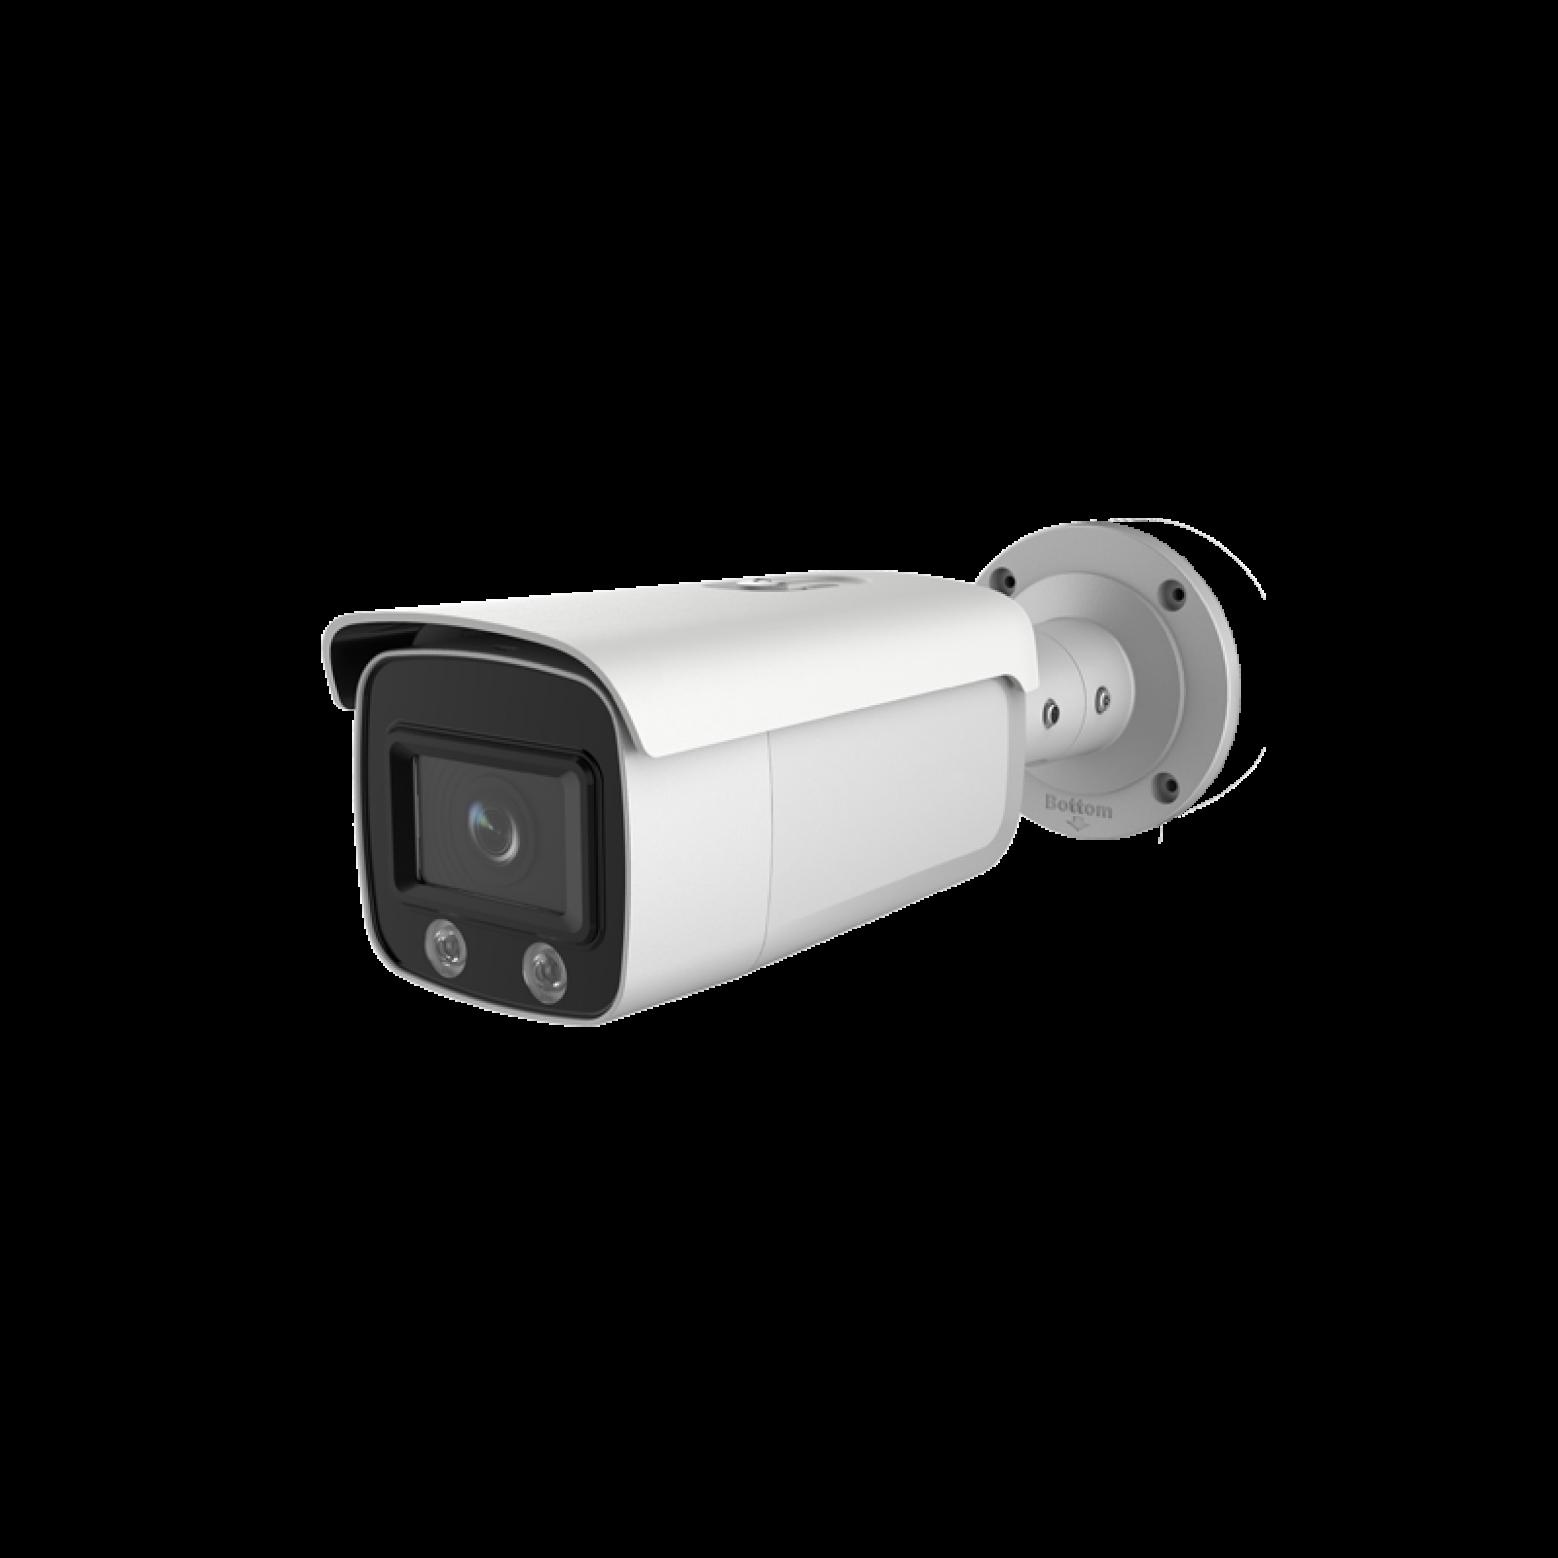 Safire SF-IPB798CWH-4U, 4 Megapixel, Night color, Bullet Camera